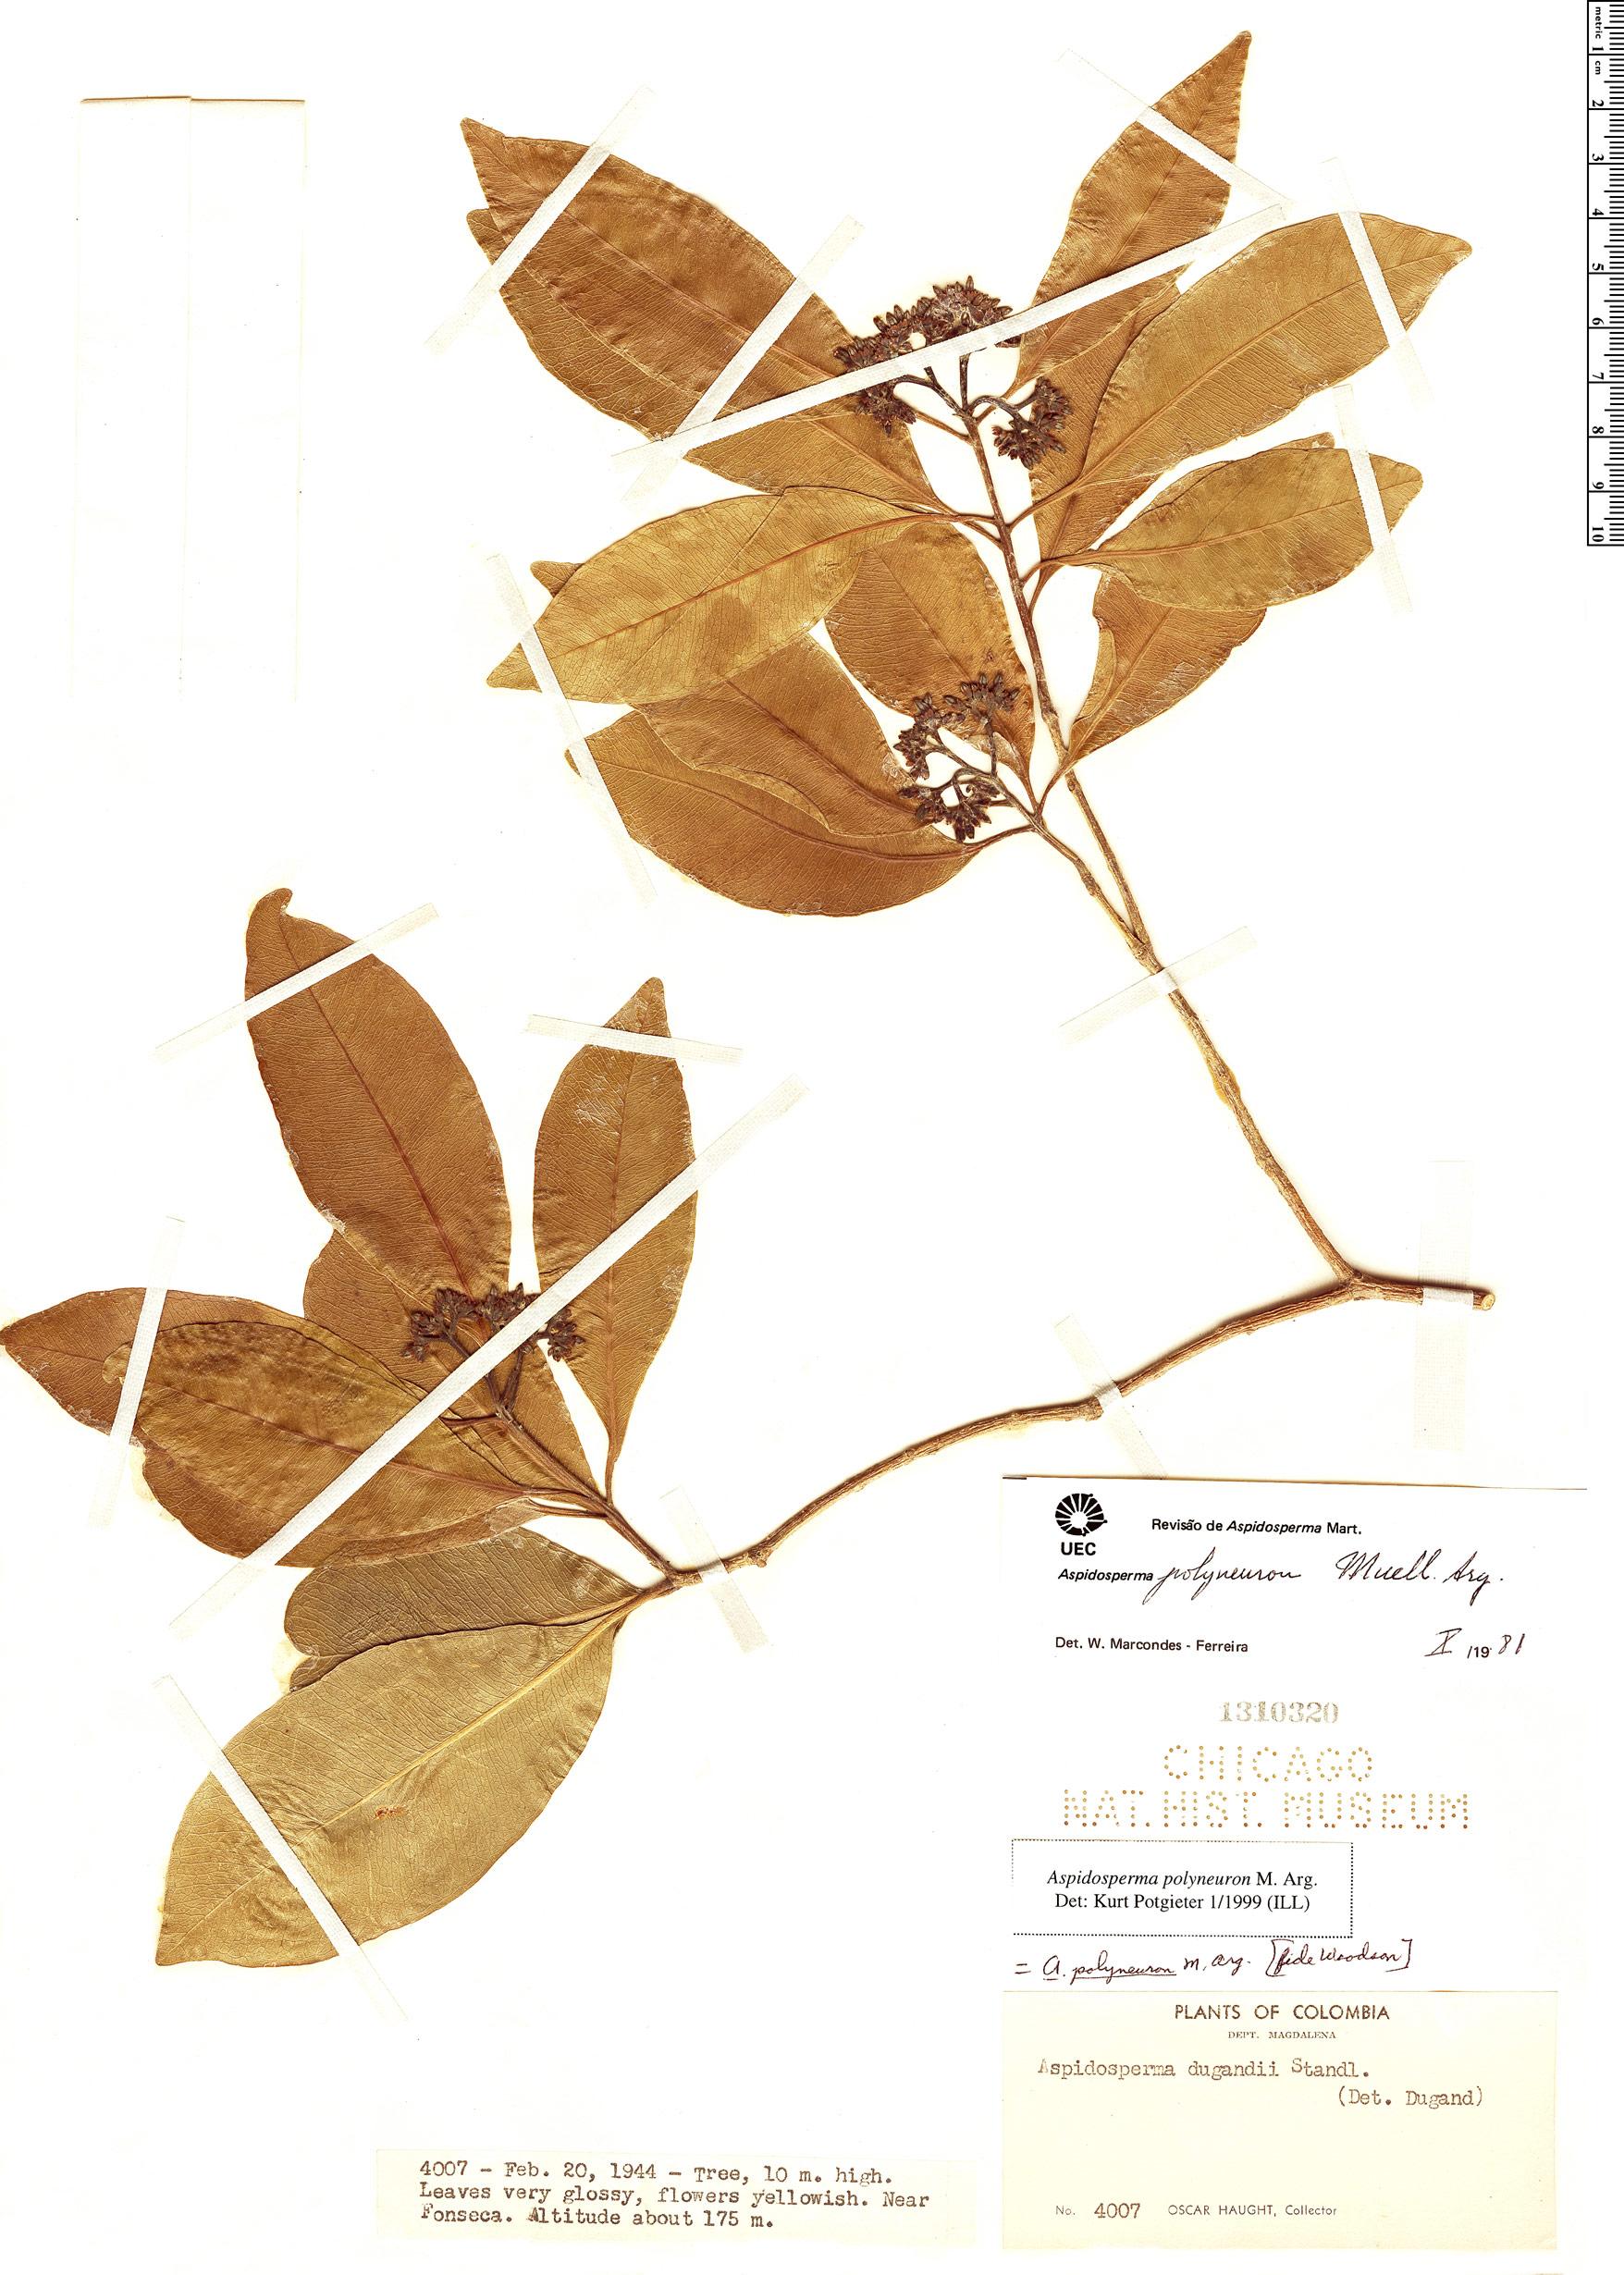 Specimen: Aspidosperma polyneuron